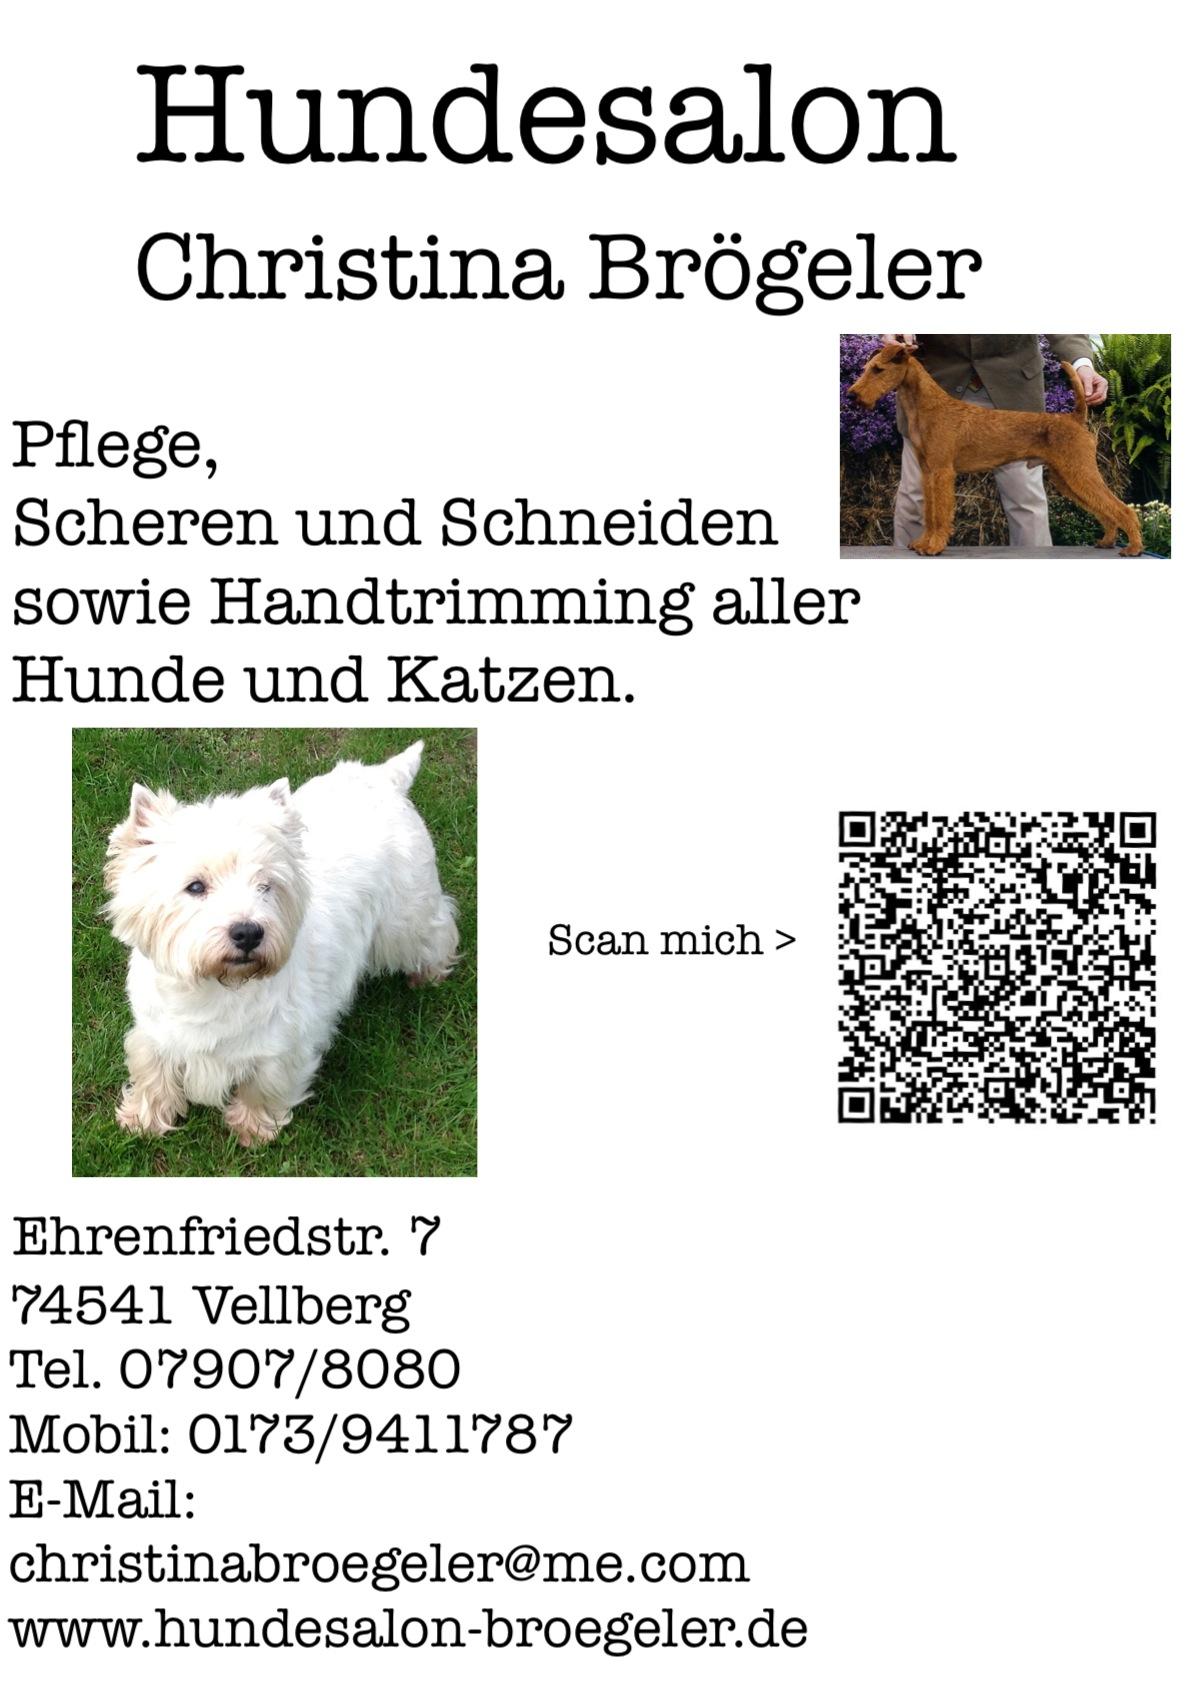 Hundesalon Christina Brögeler